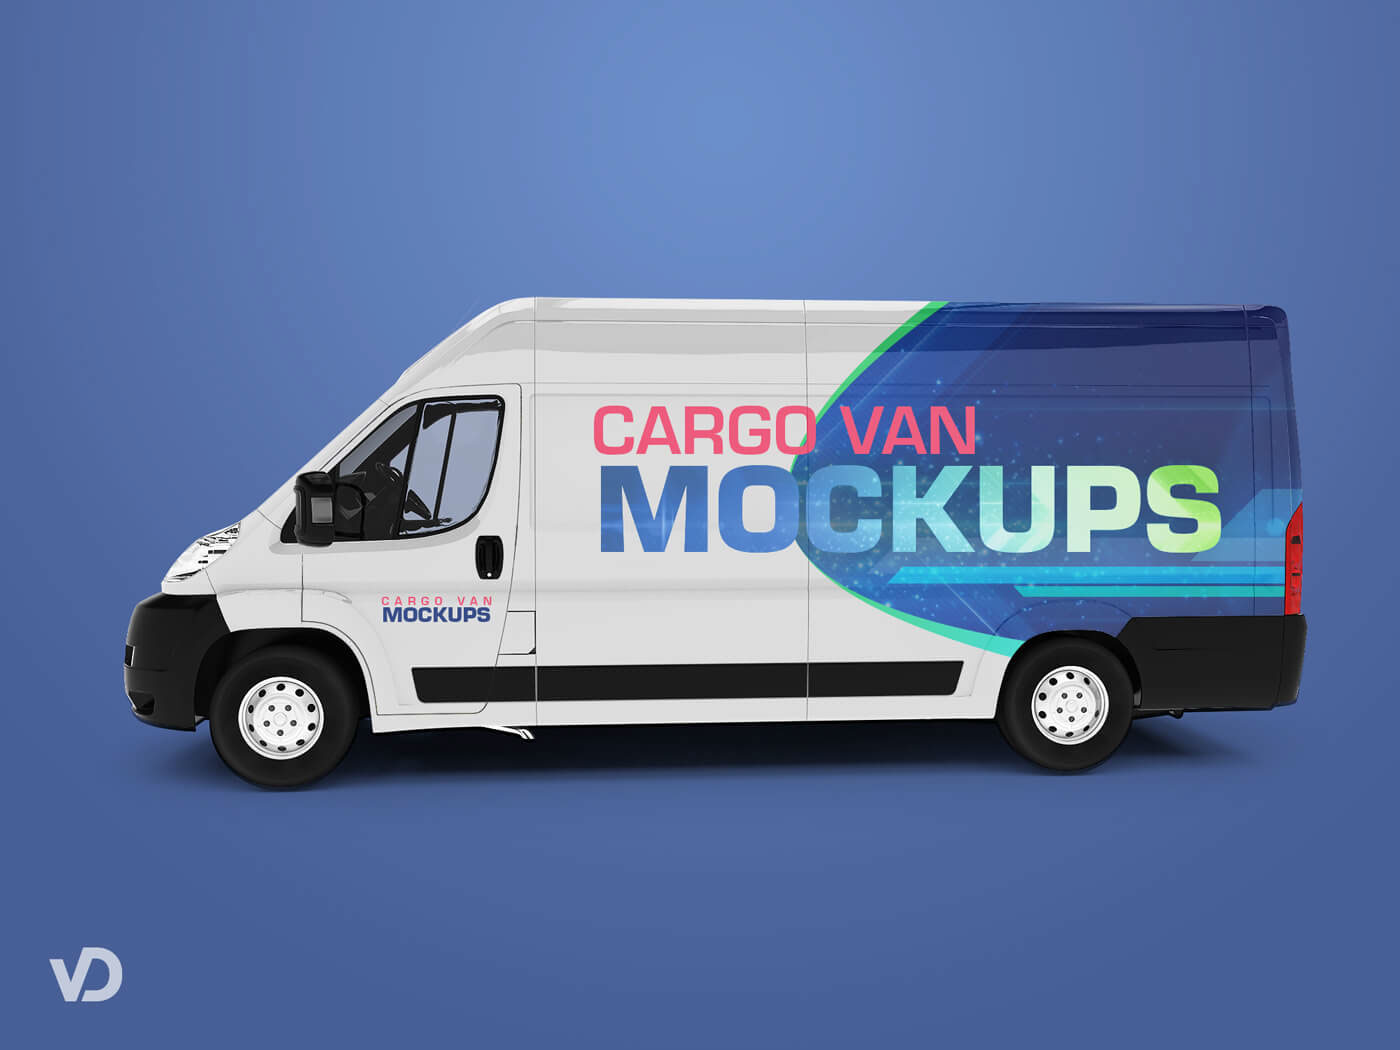 vehicle mockup psd + van mockup templates for branding your business